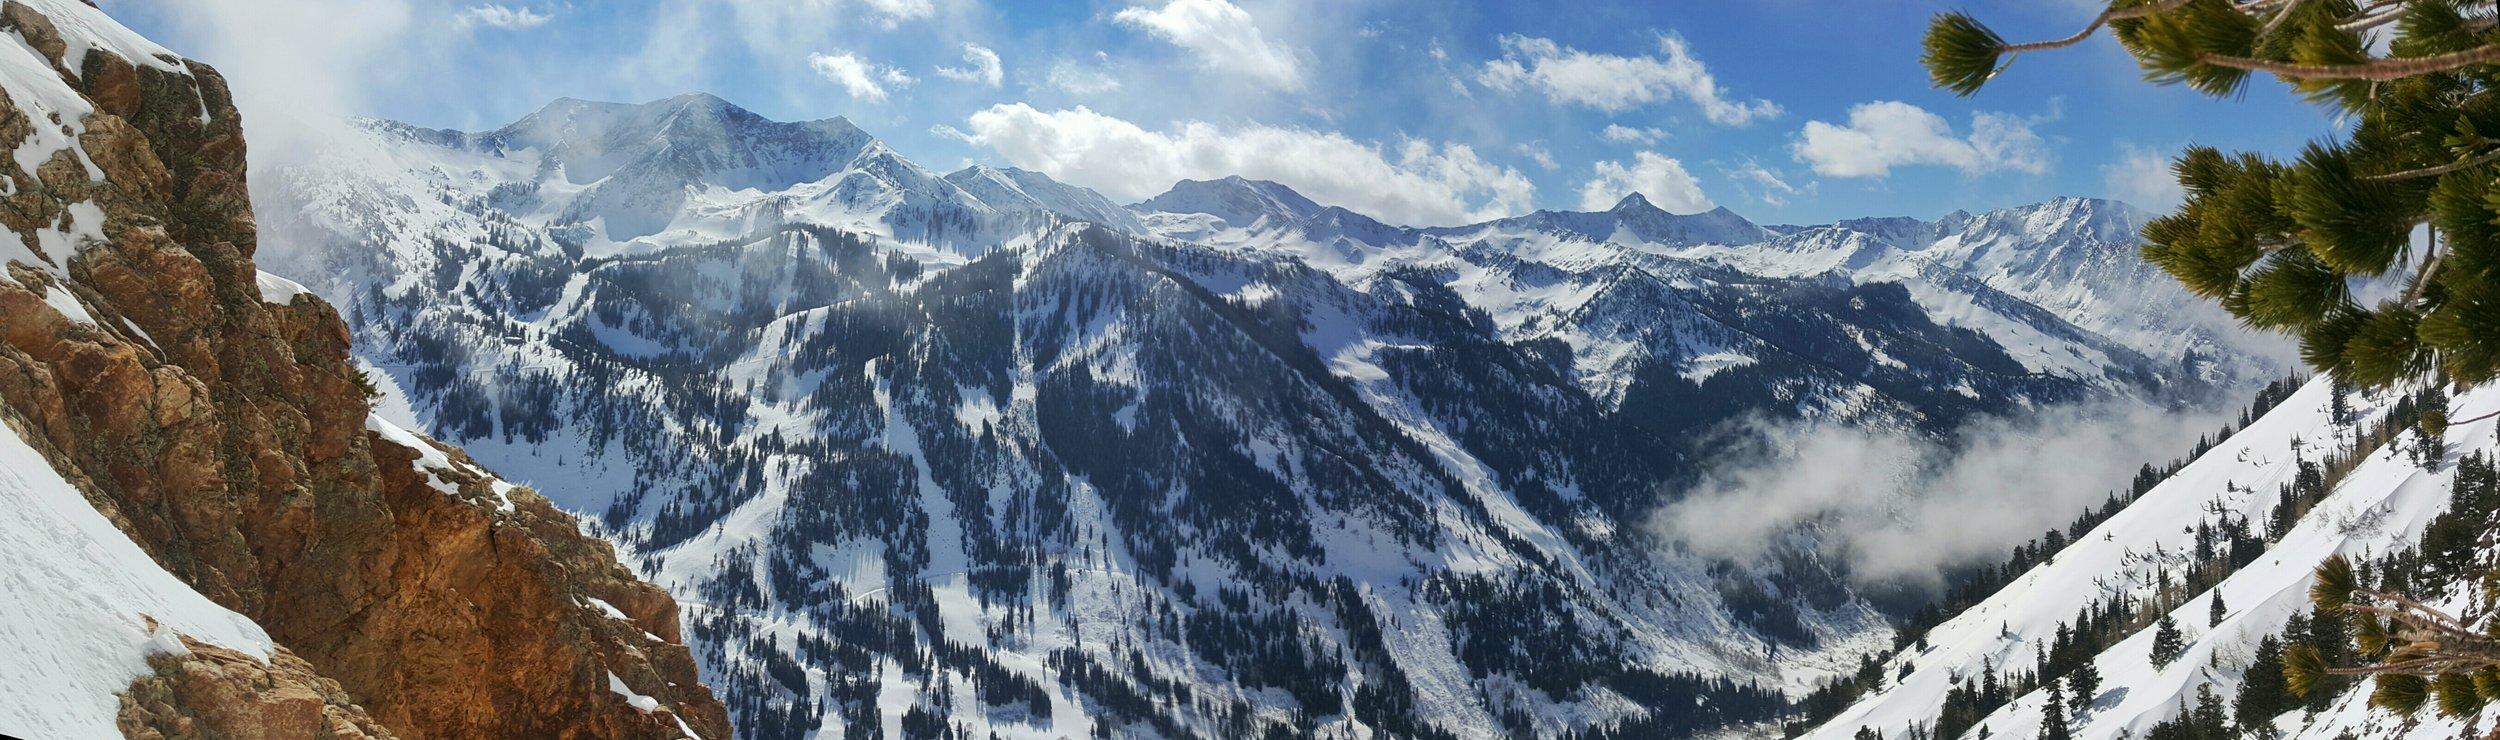 Panorama of Alta & Snowbird across from Mt. Superior.